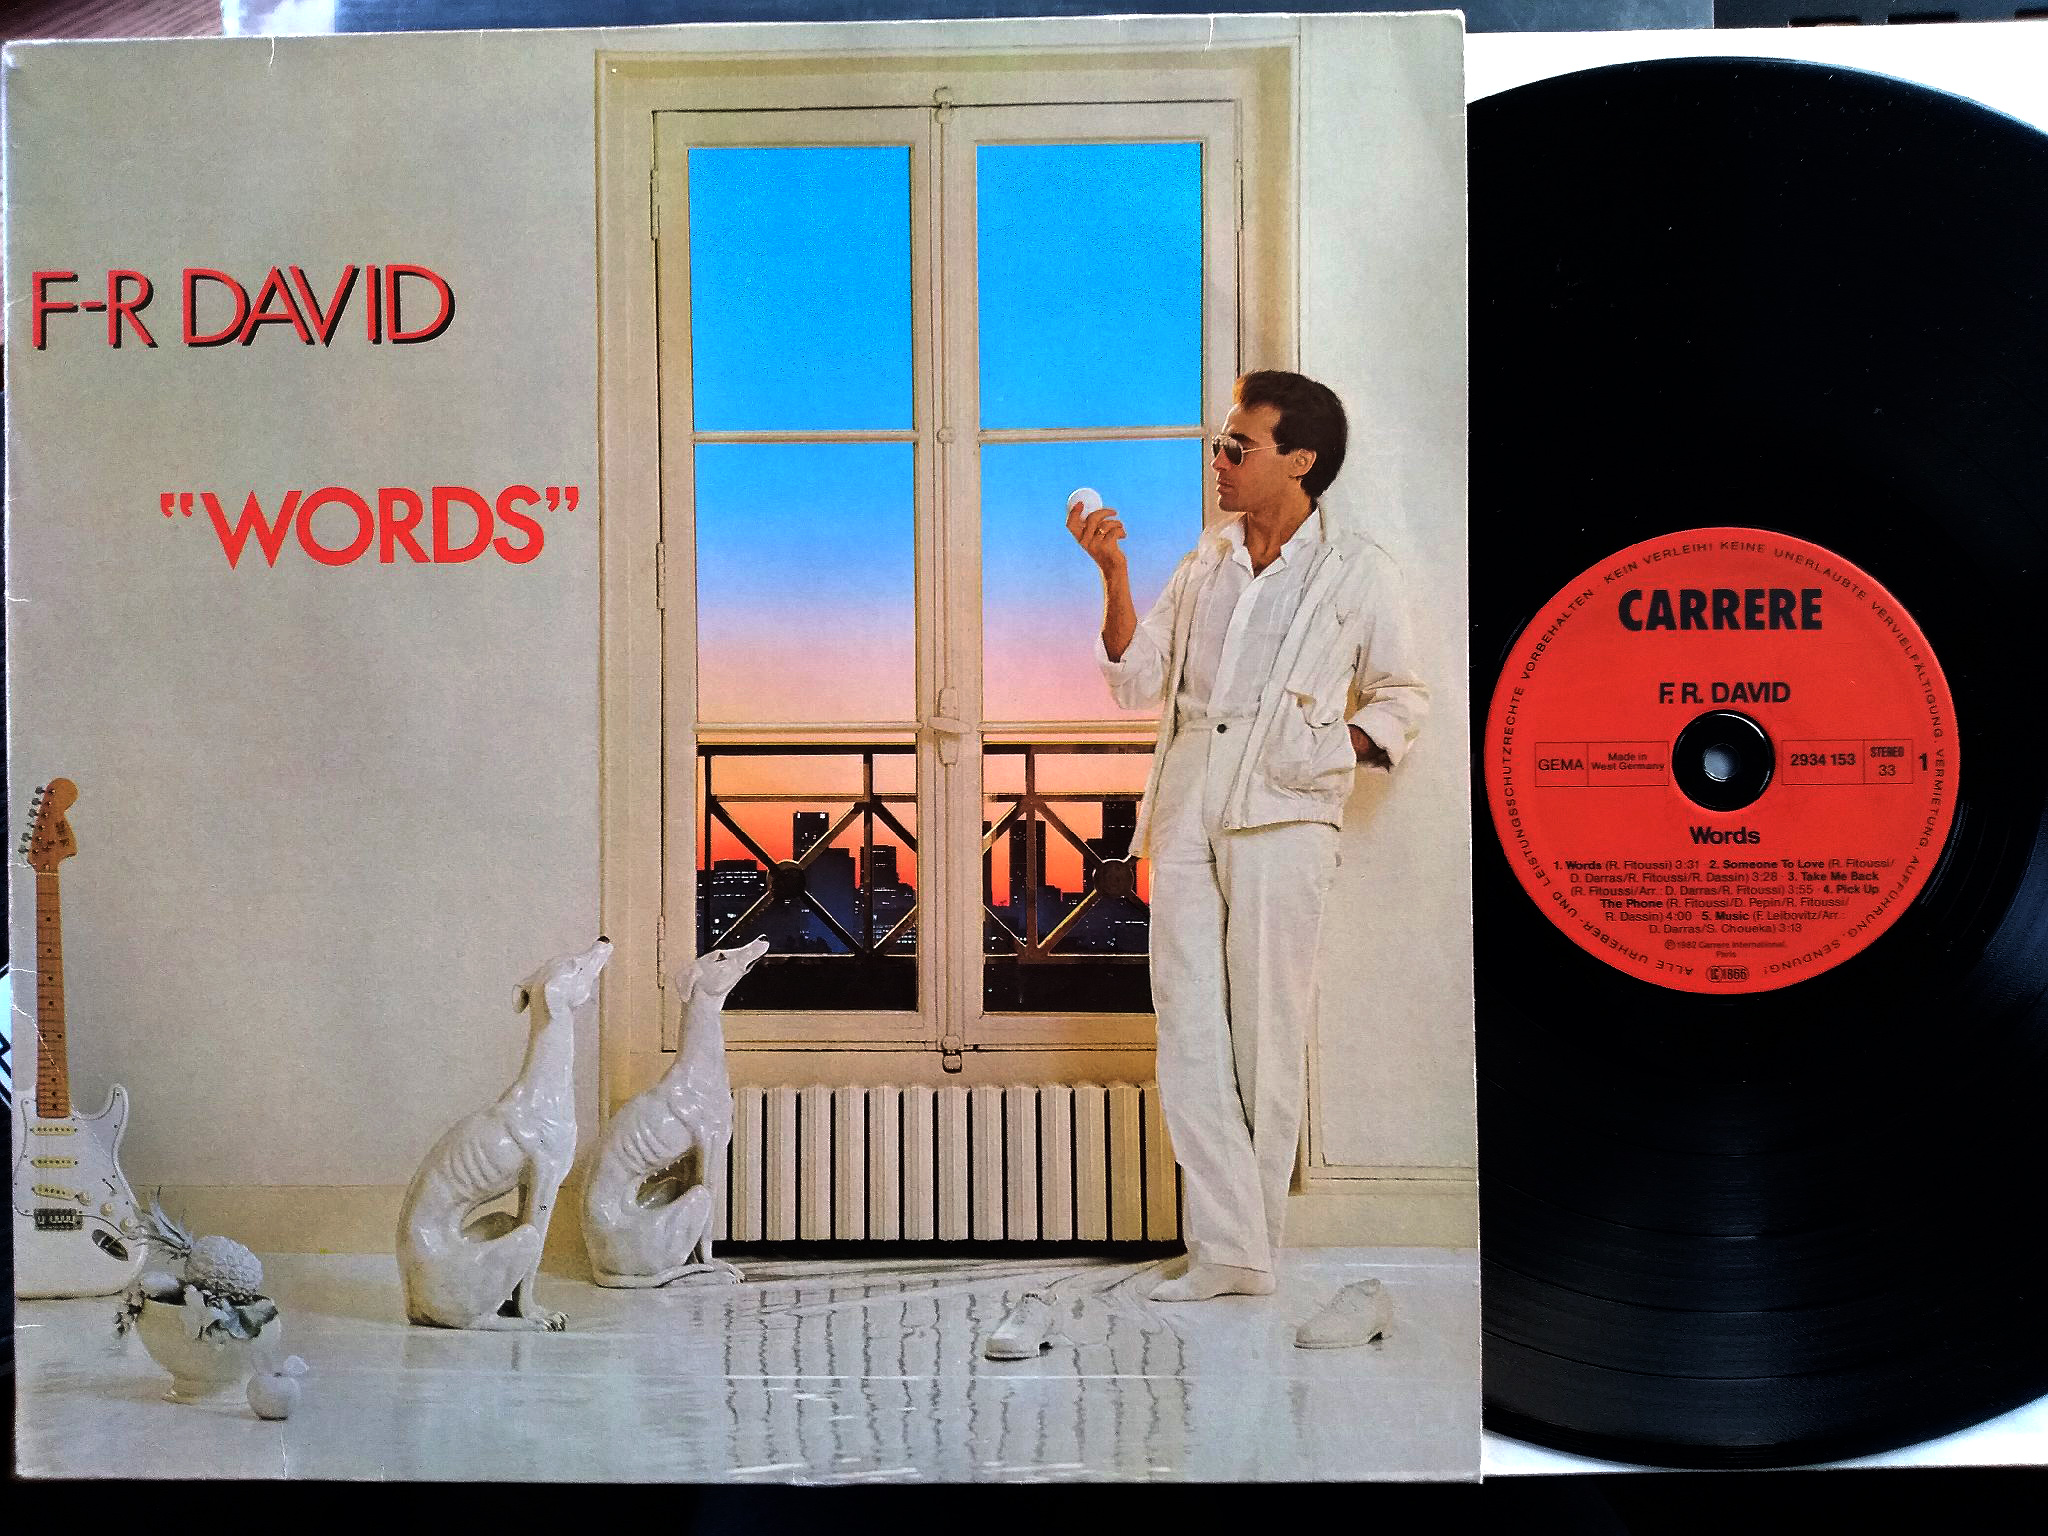 F.R David - Words LP